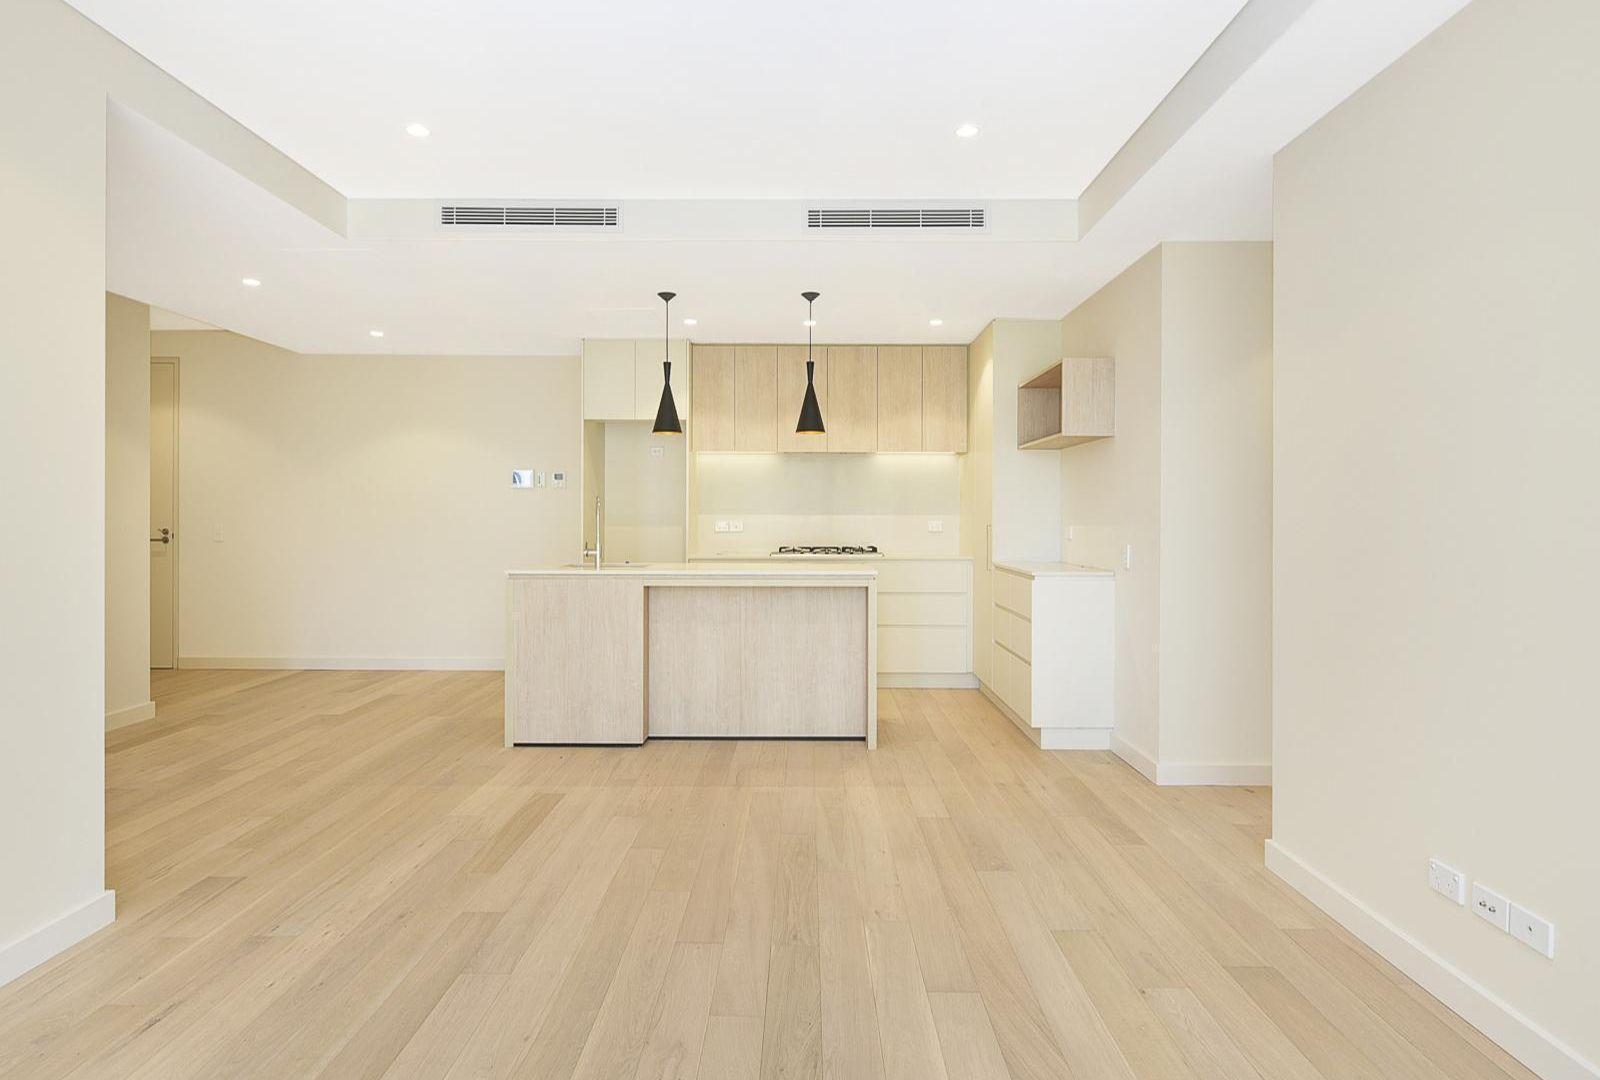 C414/2 Livingstone Avenue, Pymble NSW 2073, Image 2